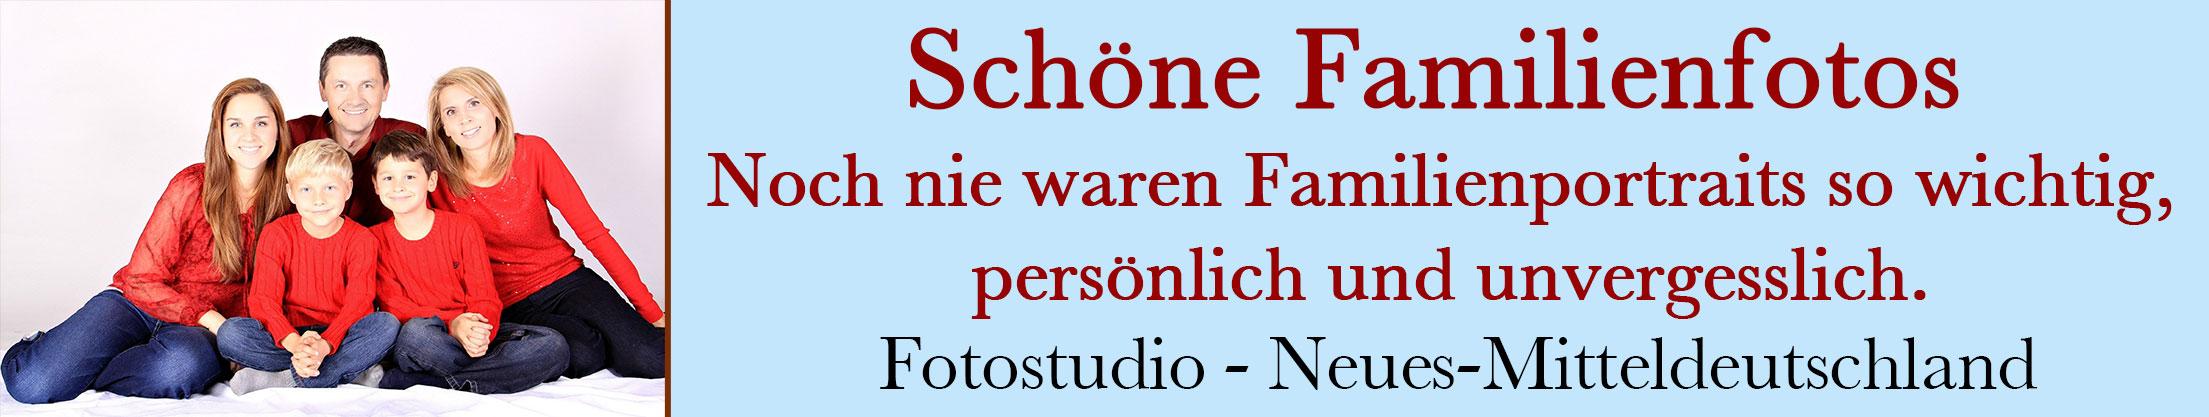 Fotostudio - Neues-Mitteldeutschalnd